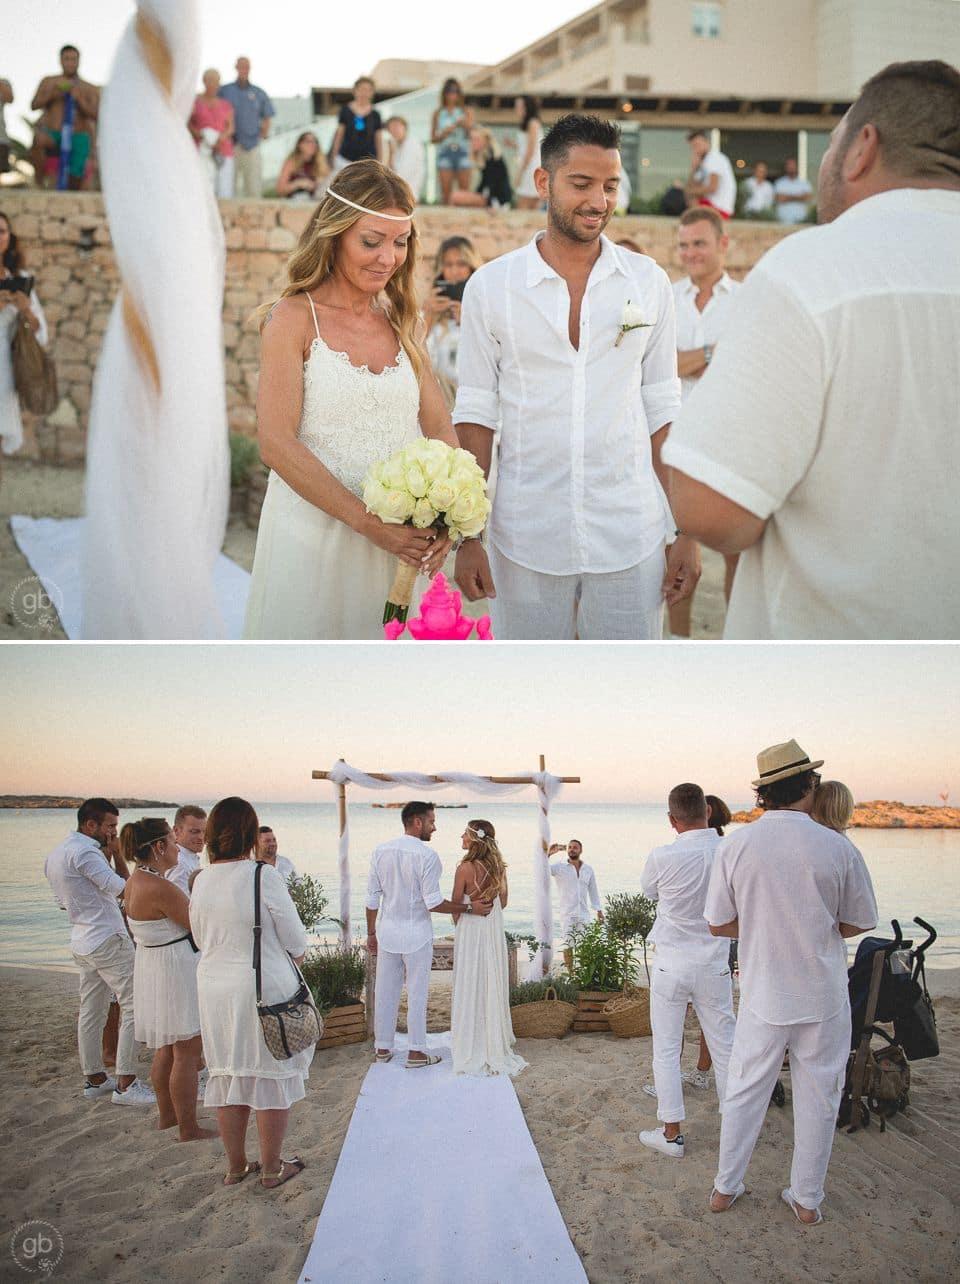 Matrimonio Spiaggia Terracina : Matrimonio in spiaggia a formentera